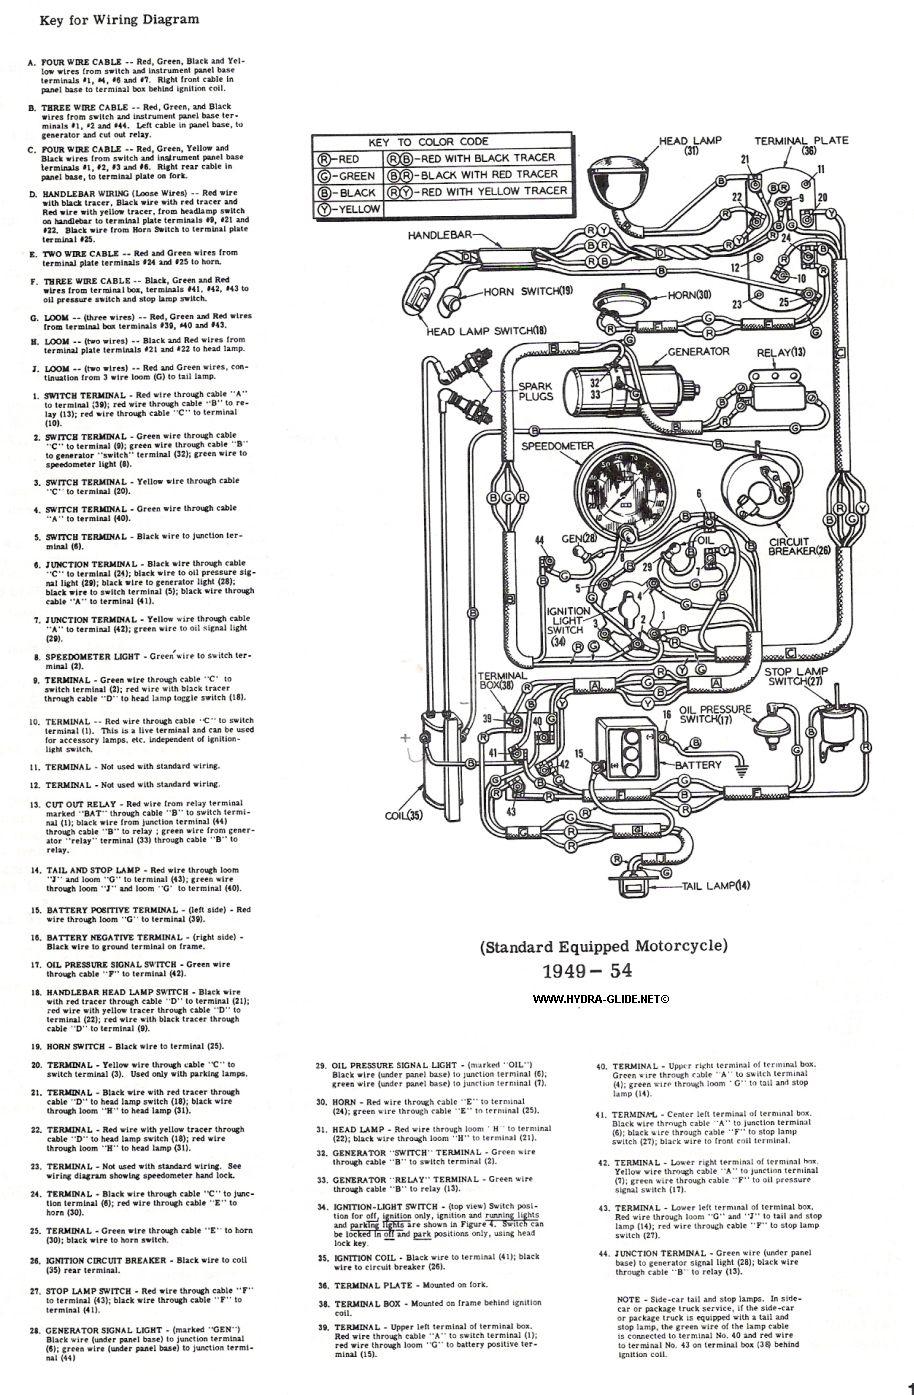 12 Volt Ignition Coil Wiring Diagram | Wiring Diagram - 12 Volt Ignition Coil Wiring Diagram